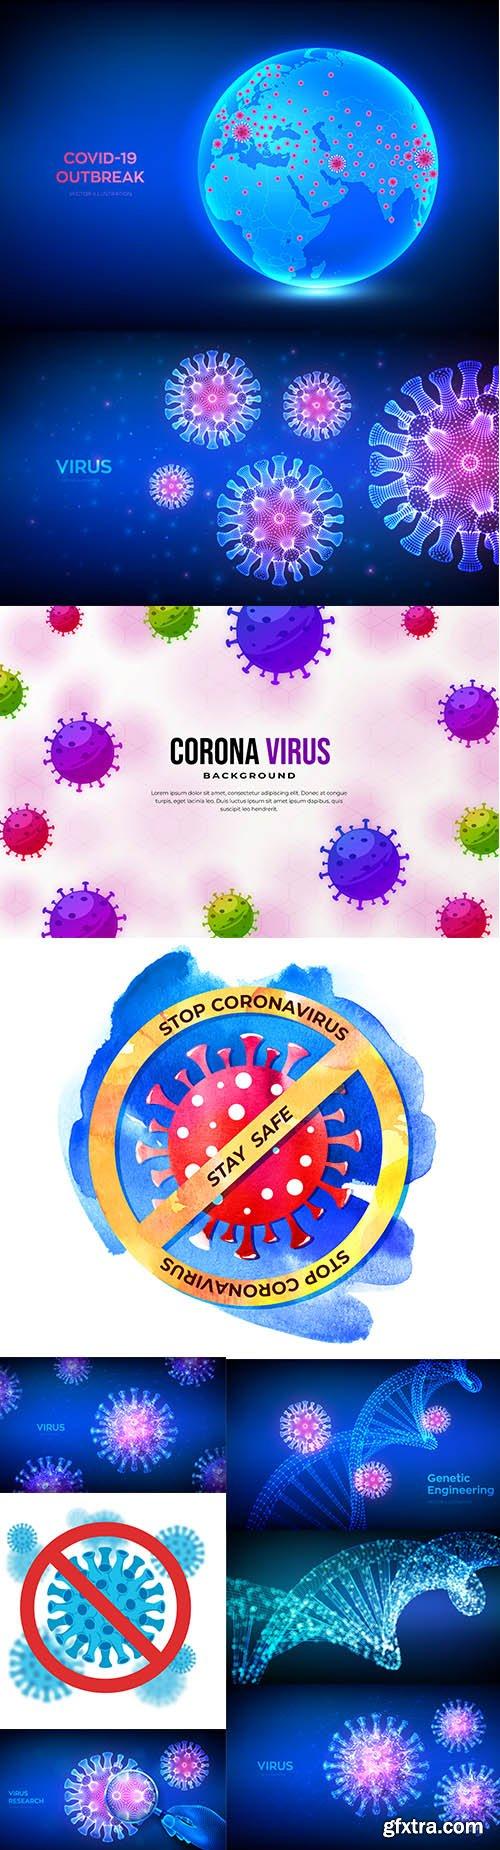 2019 Covid-19 Coronavirus Concept Illustration Set Vol 2